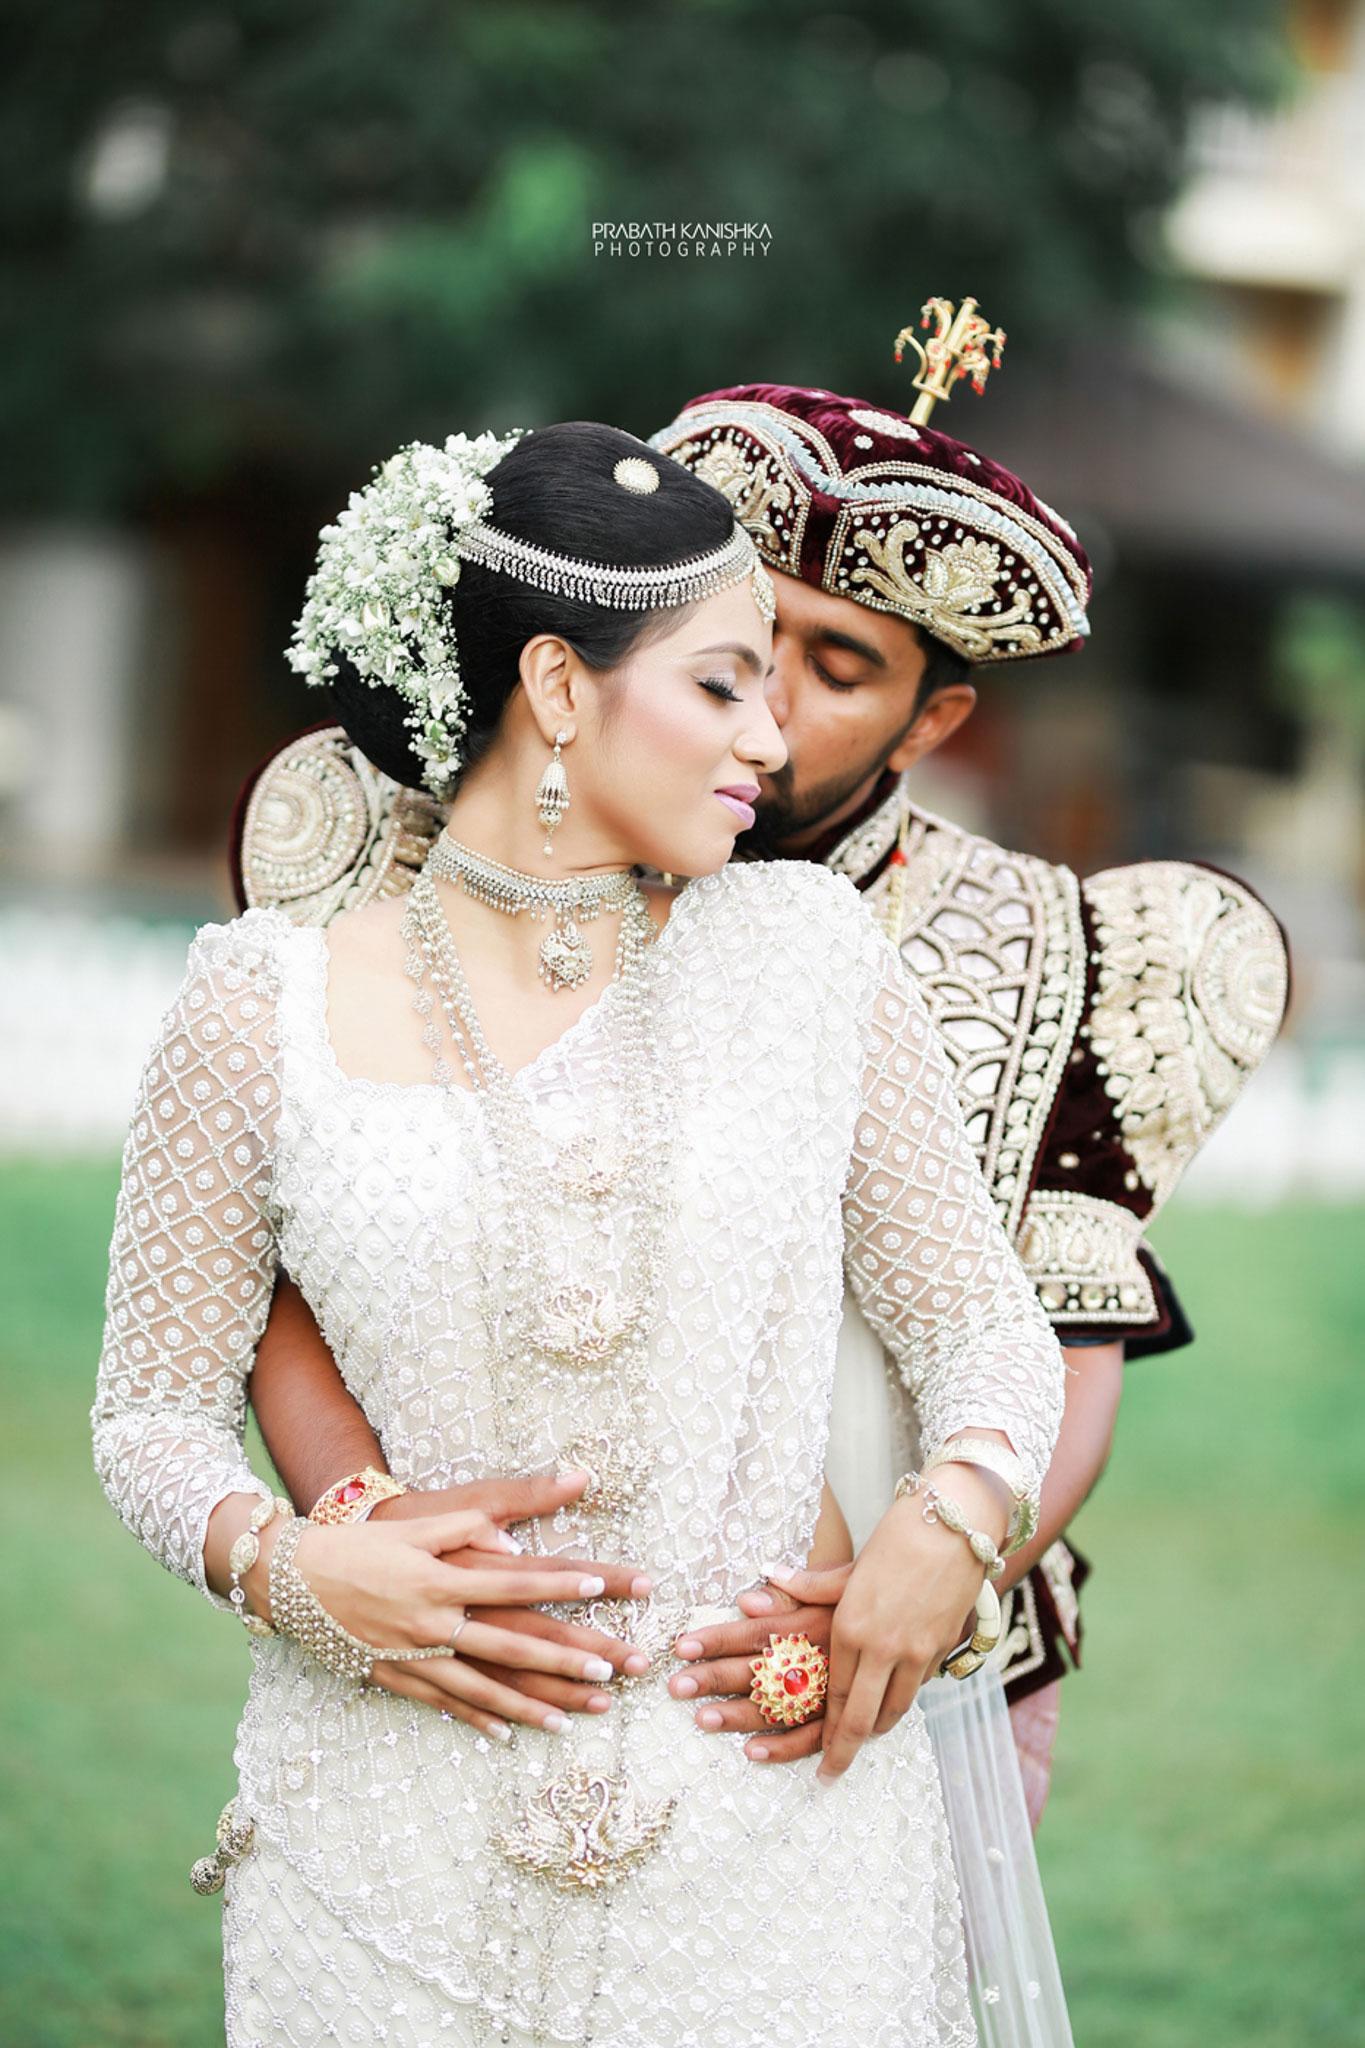 Chathumali & Lahiru - Prabath Kanishka Wedding Photography